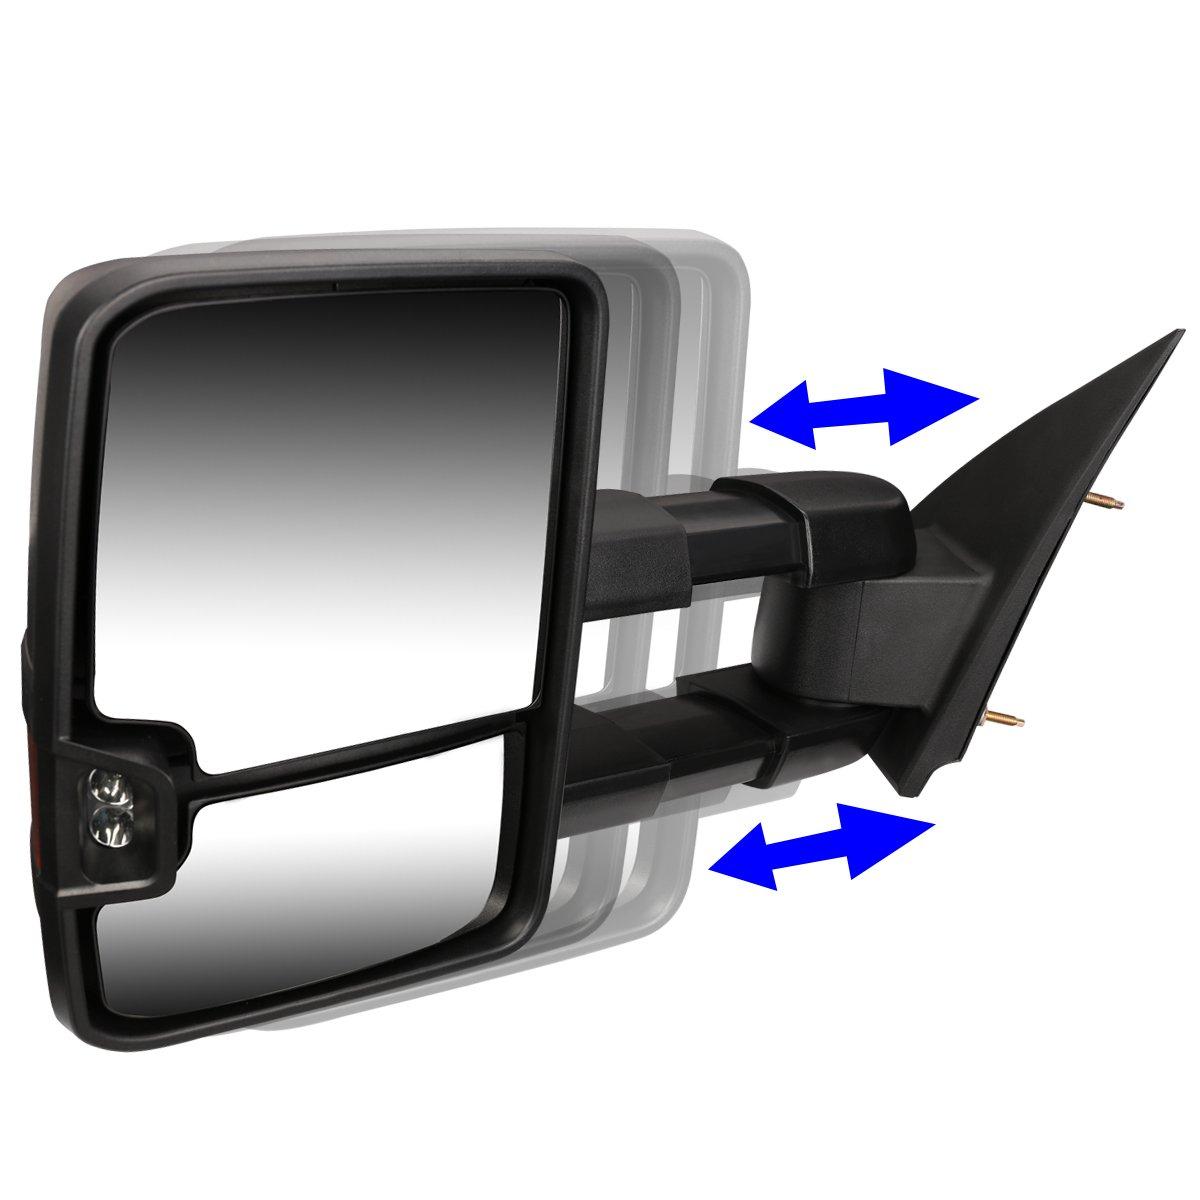 For Silverado/Sierra Pair of Black Manual Folding w/Amber LED Turn Signal  Towing Mirrors